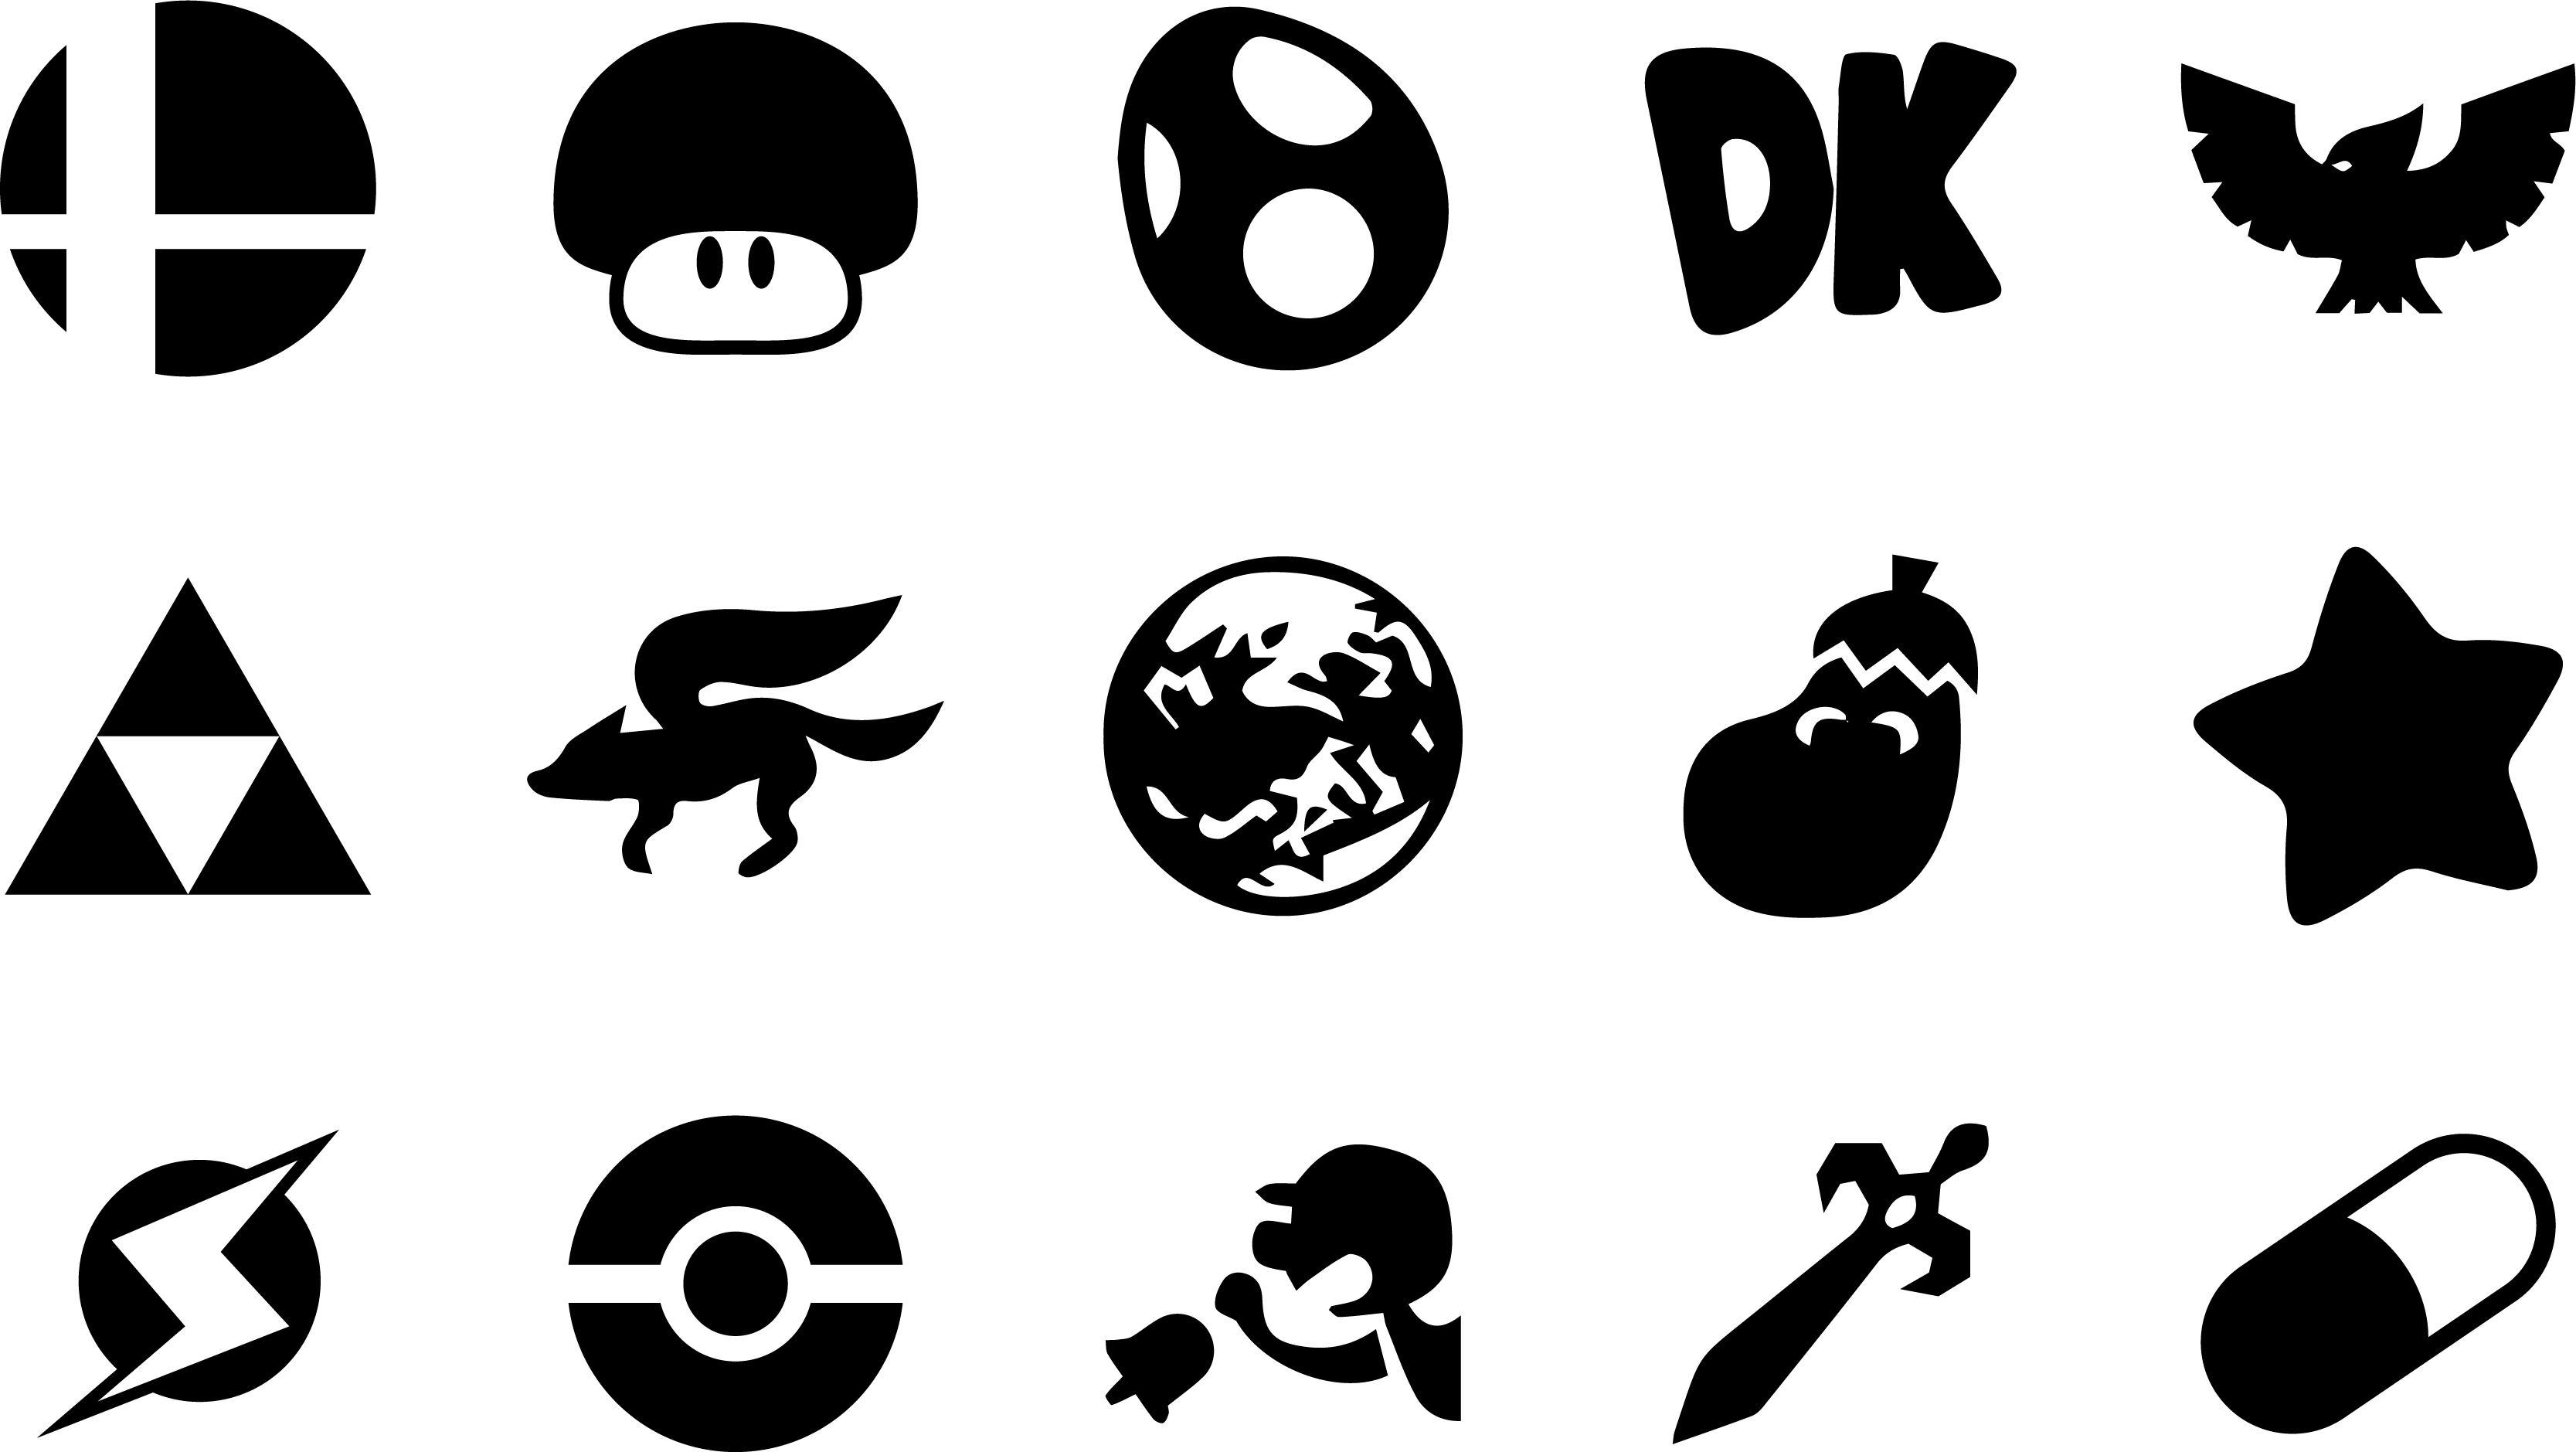 Super Smash Bros Melee Icons by oneseb on DeviantArt